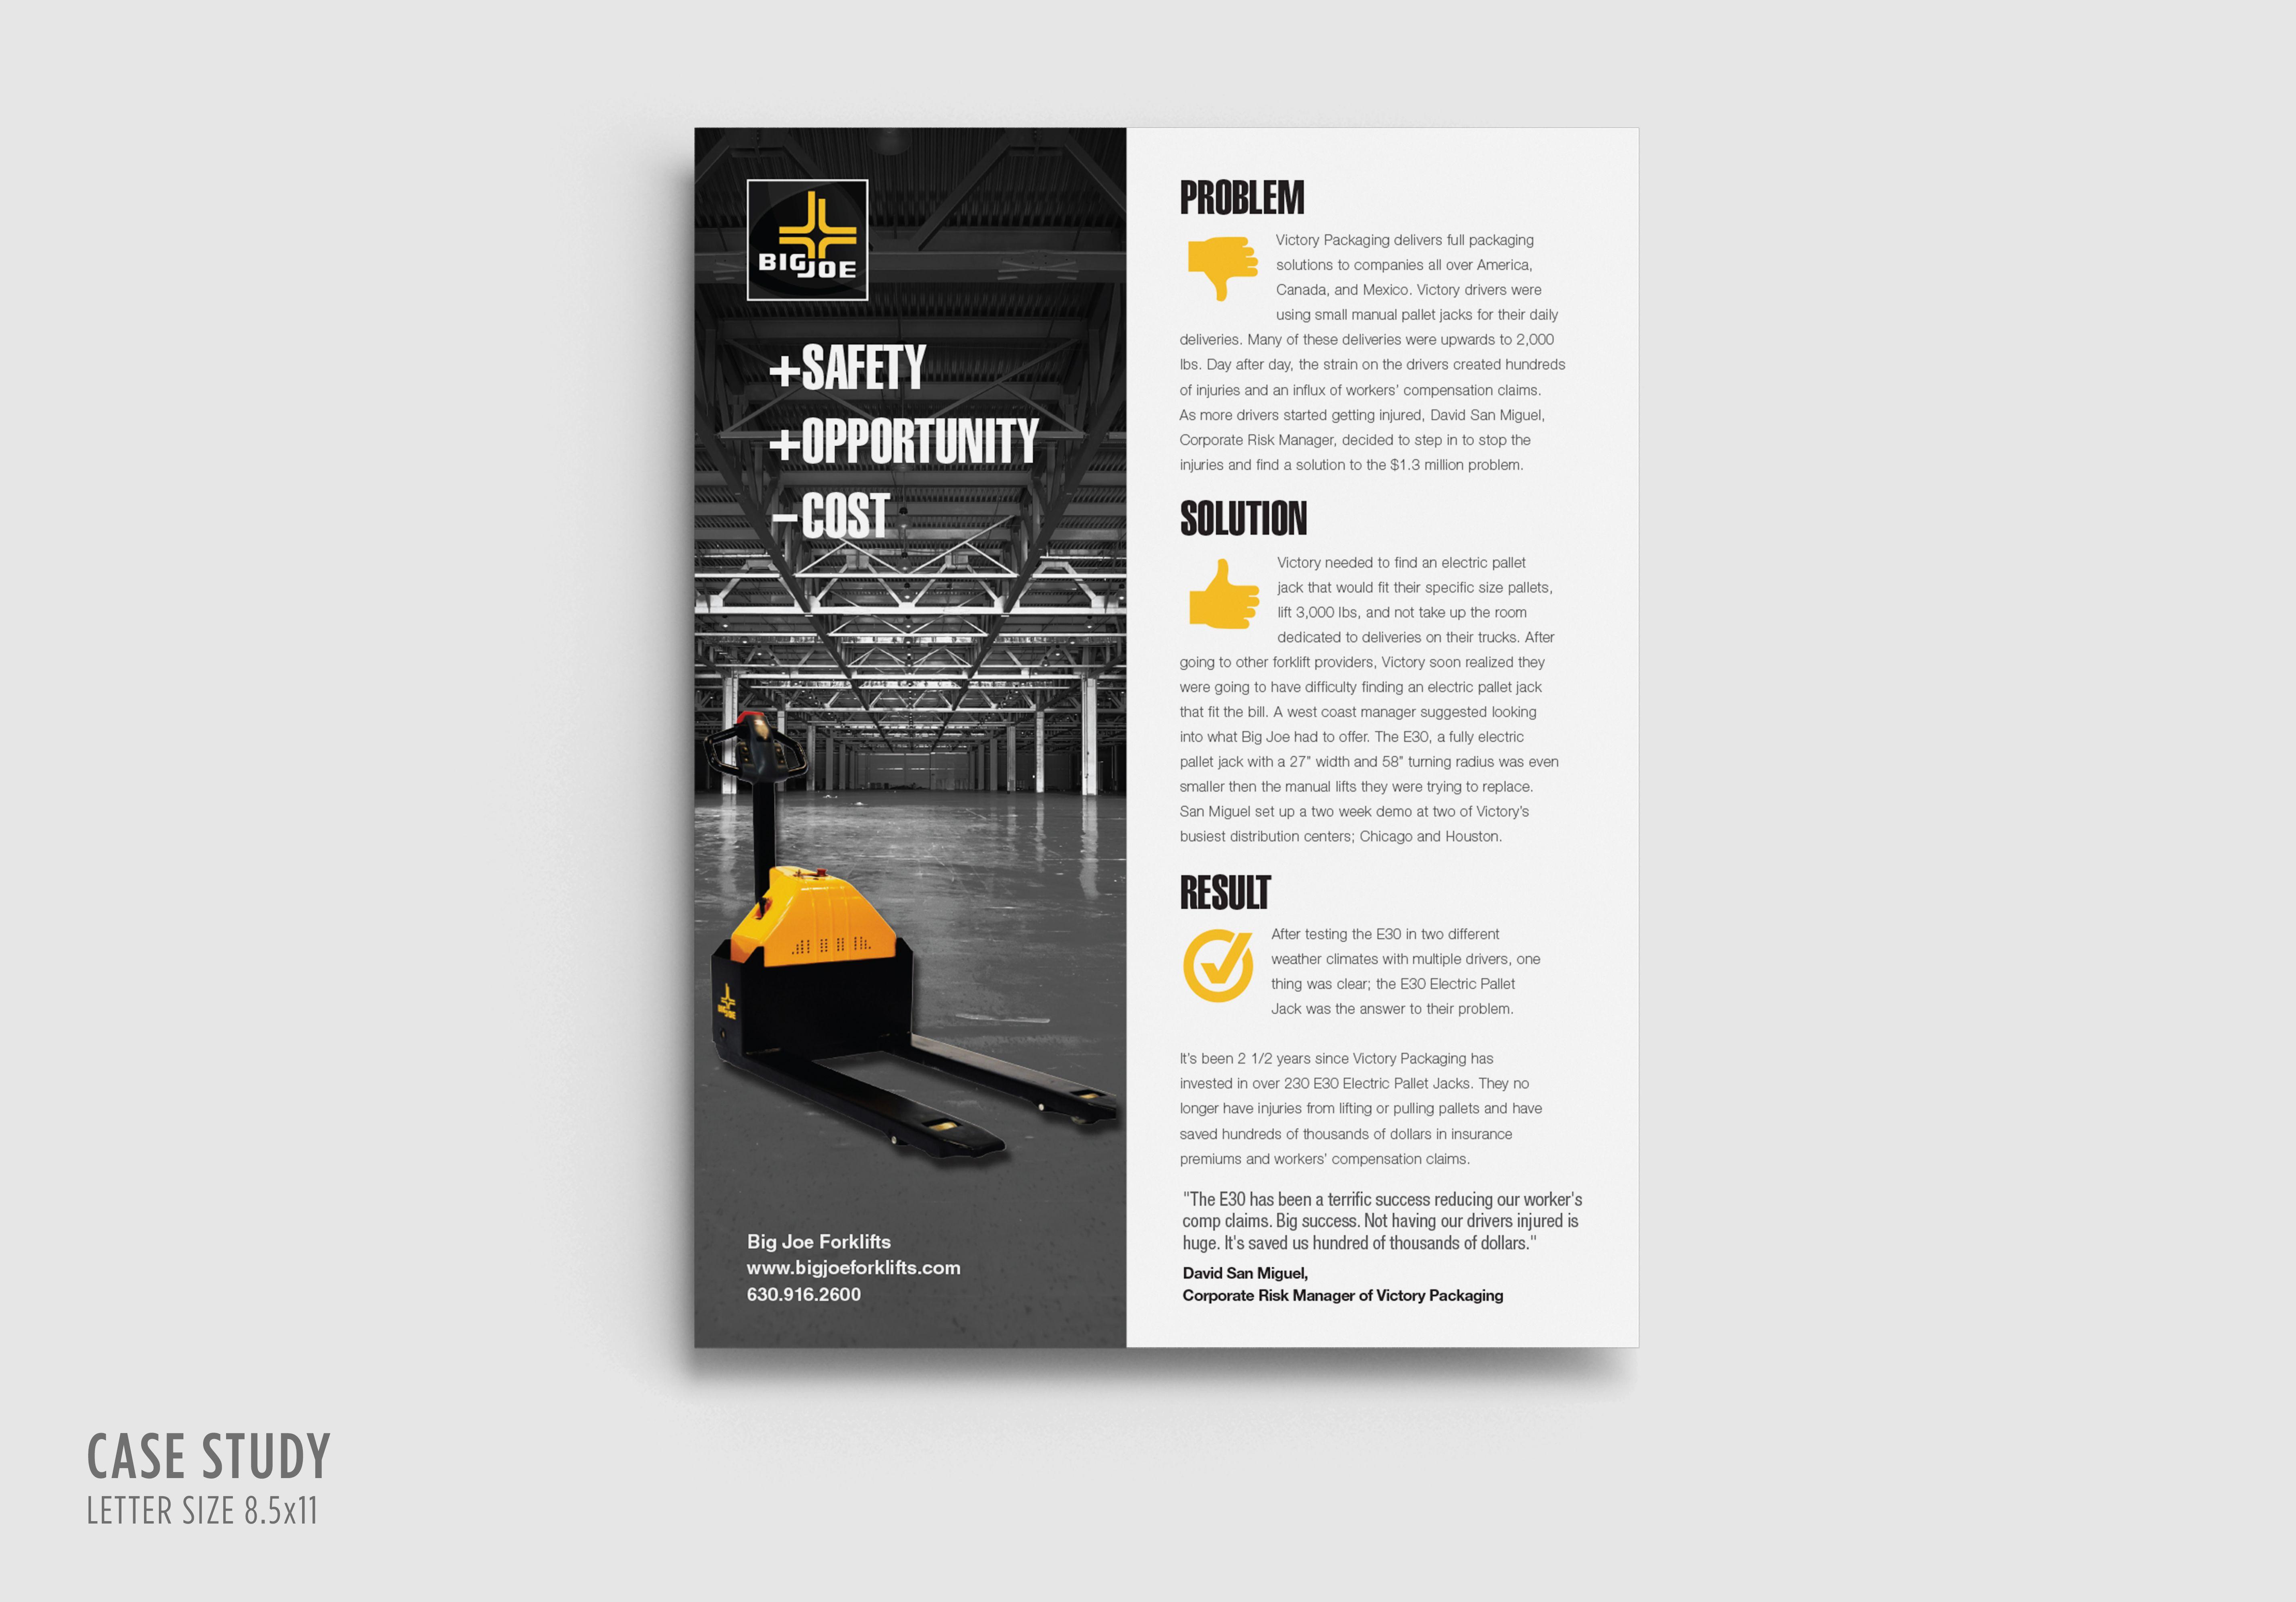 Bigjoe Casestudy 8 5x11 Case Study Design Case Study Marketing